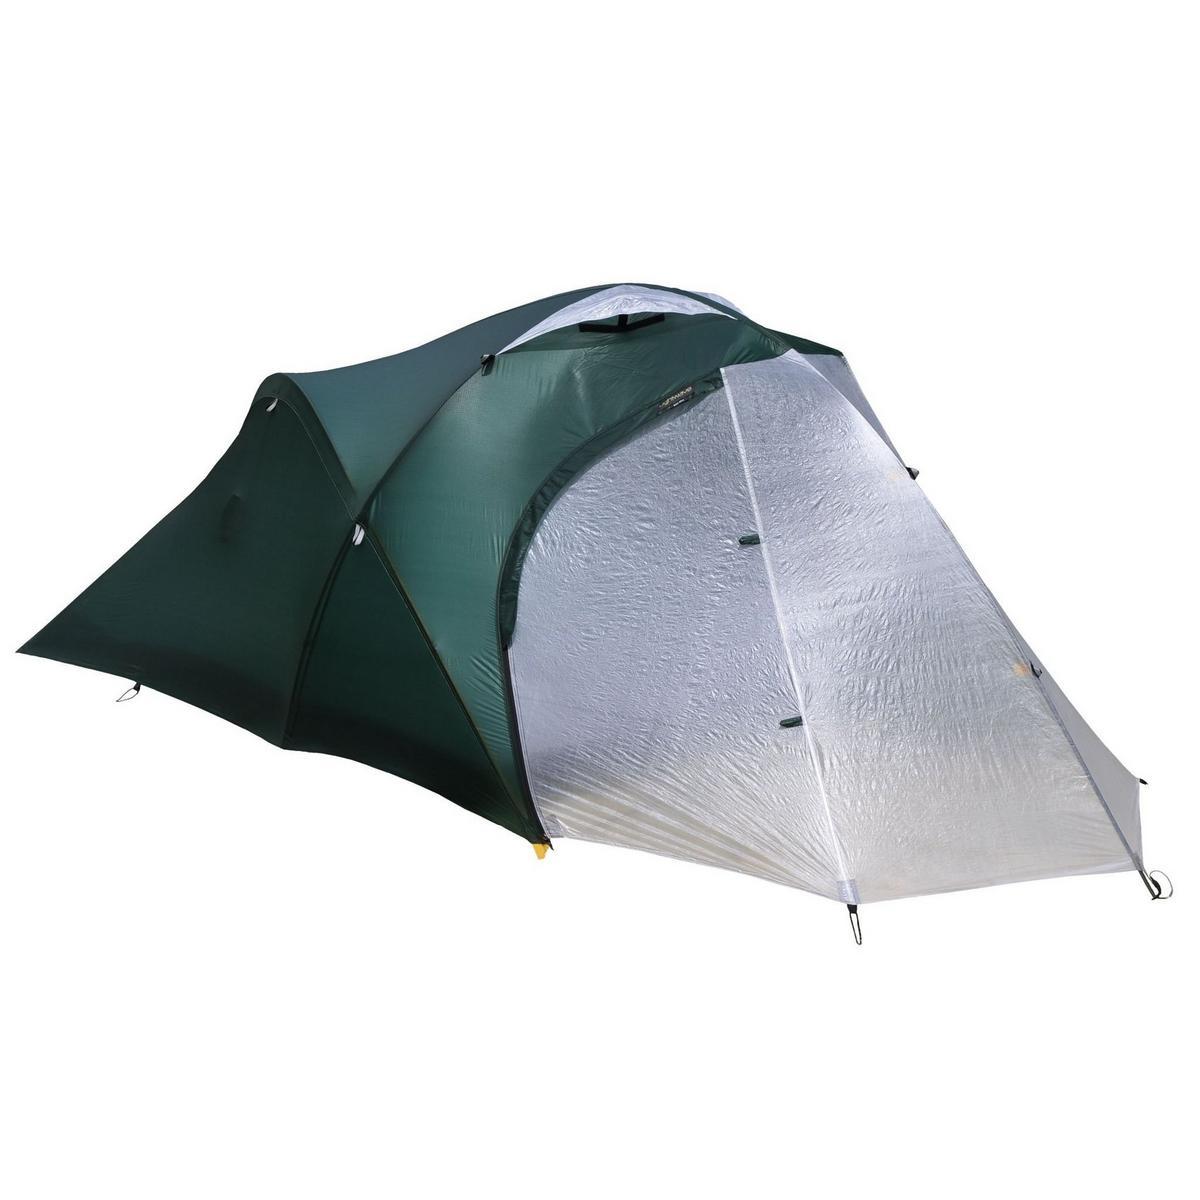 Lightwave Tent  G20 Mtn Forest Green